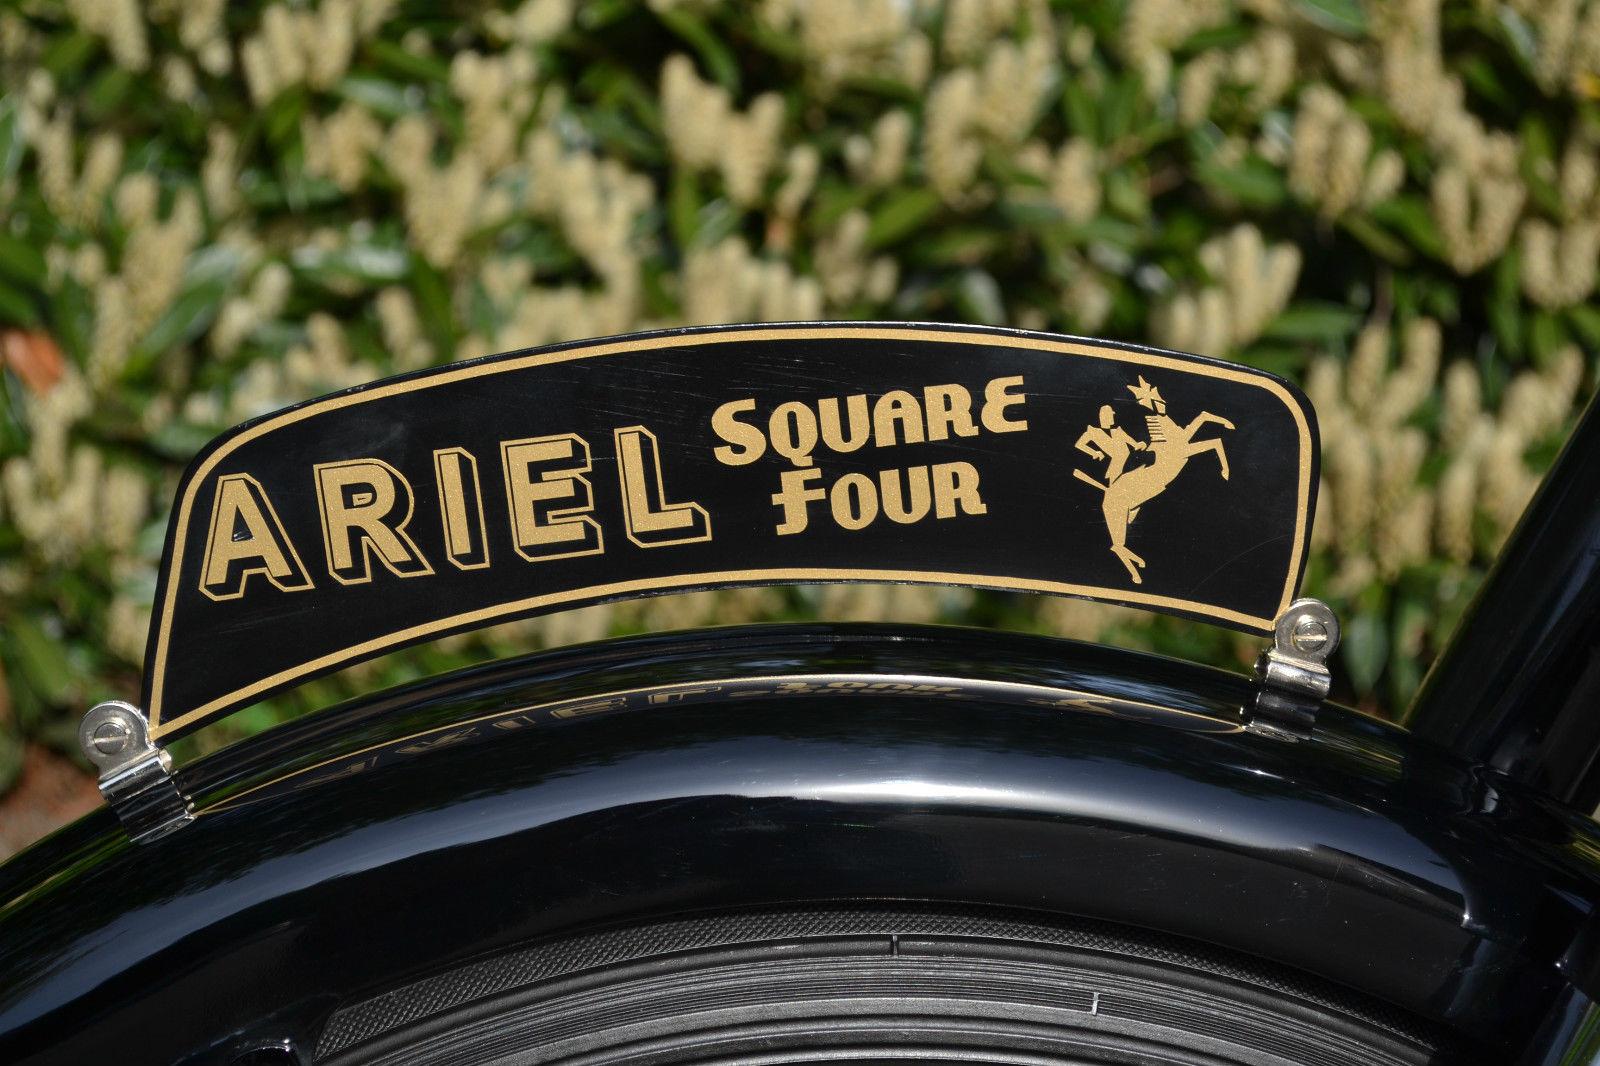 Four Square Court (1952)